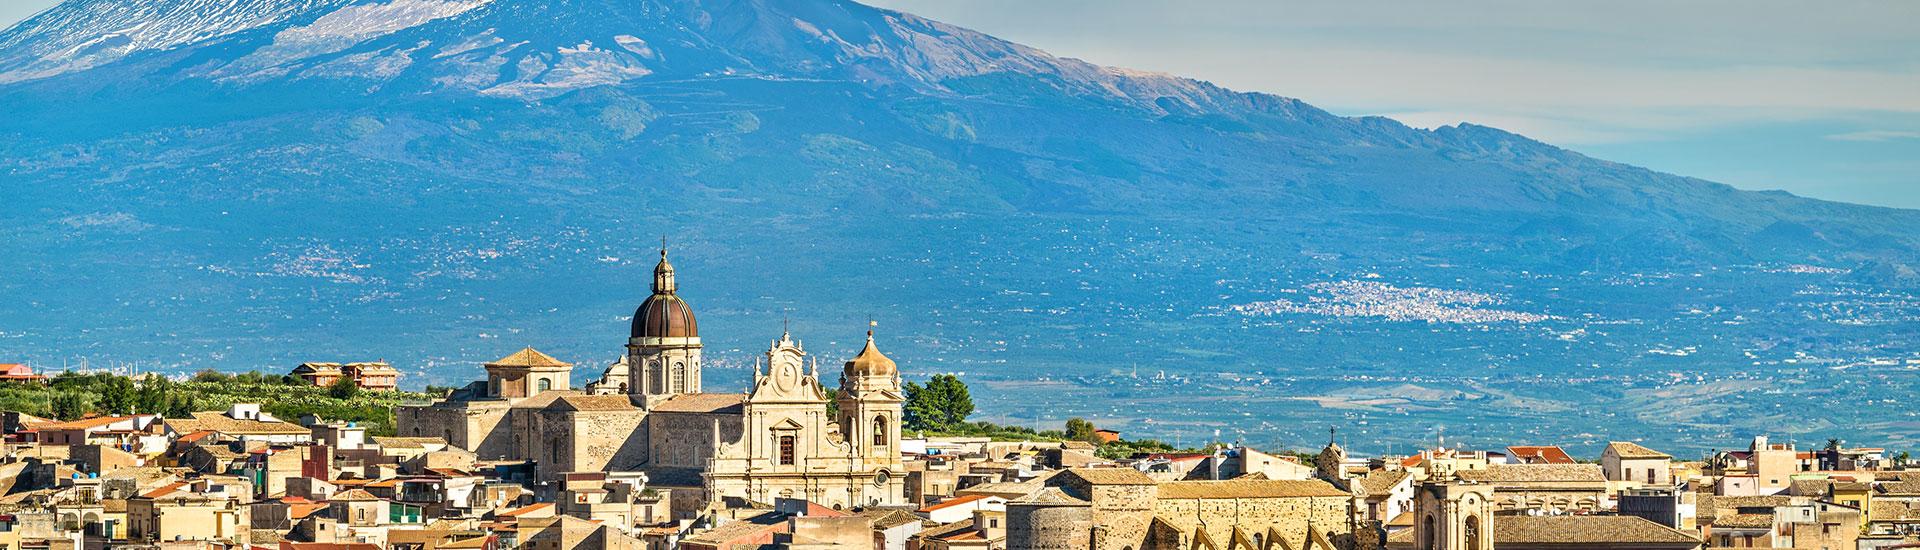 Hotels Sicily hero